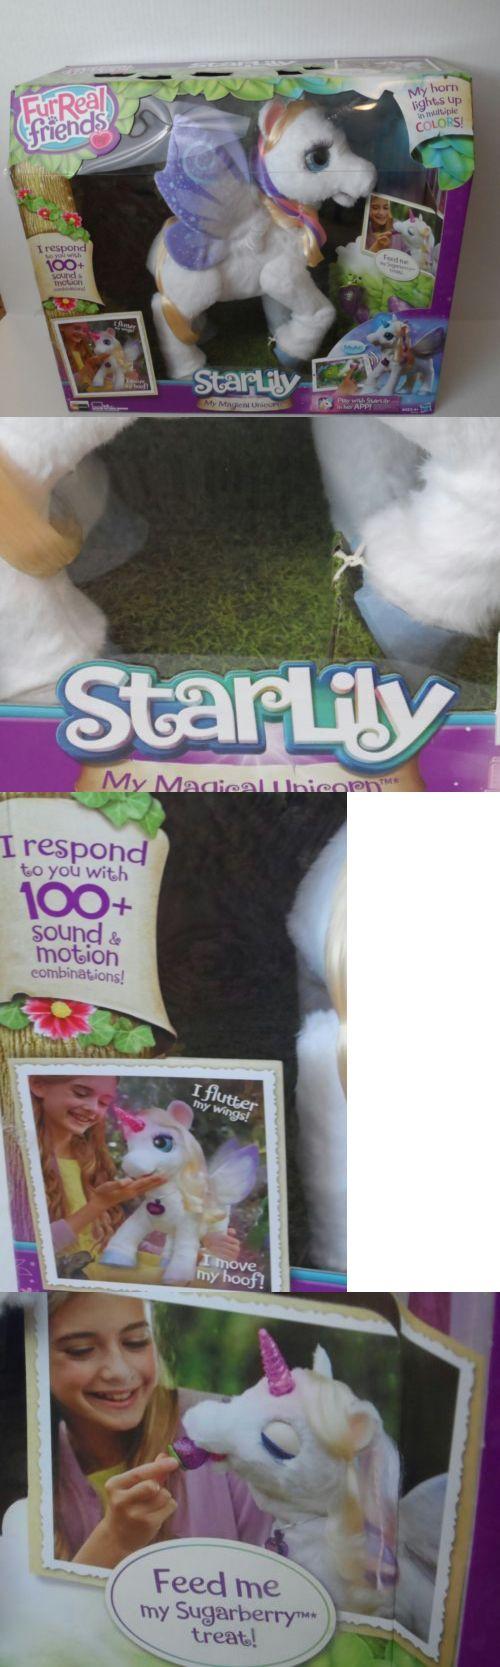 FurReal Friends 38288: Girls (Nib) Furreal Friends Starlily By Hasbro My Magical Unicorn -> BUY IT NOW ONLY: $79.99 on eBay!